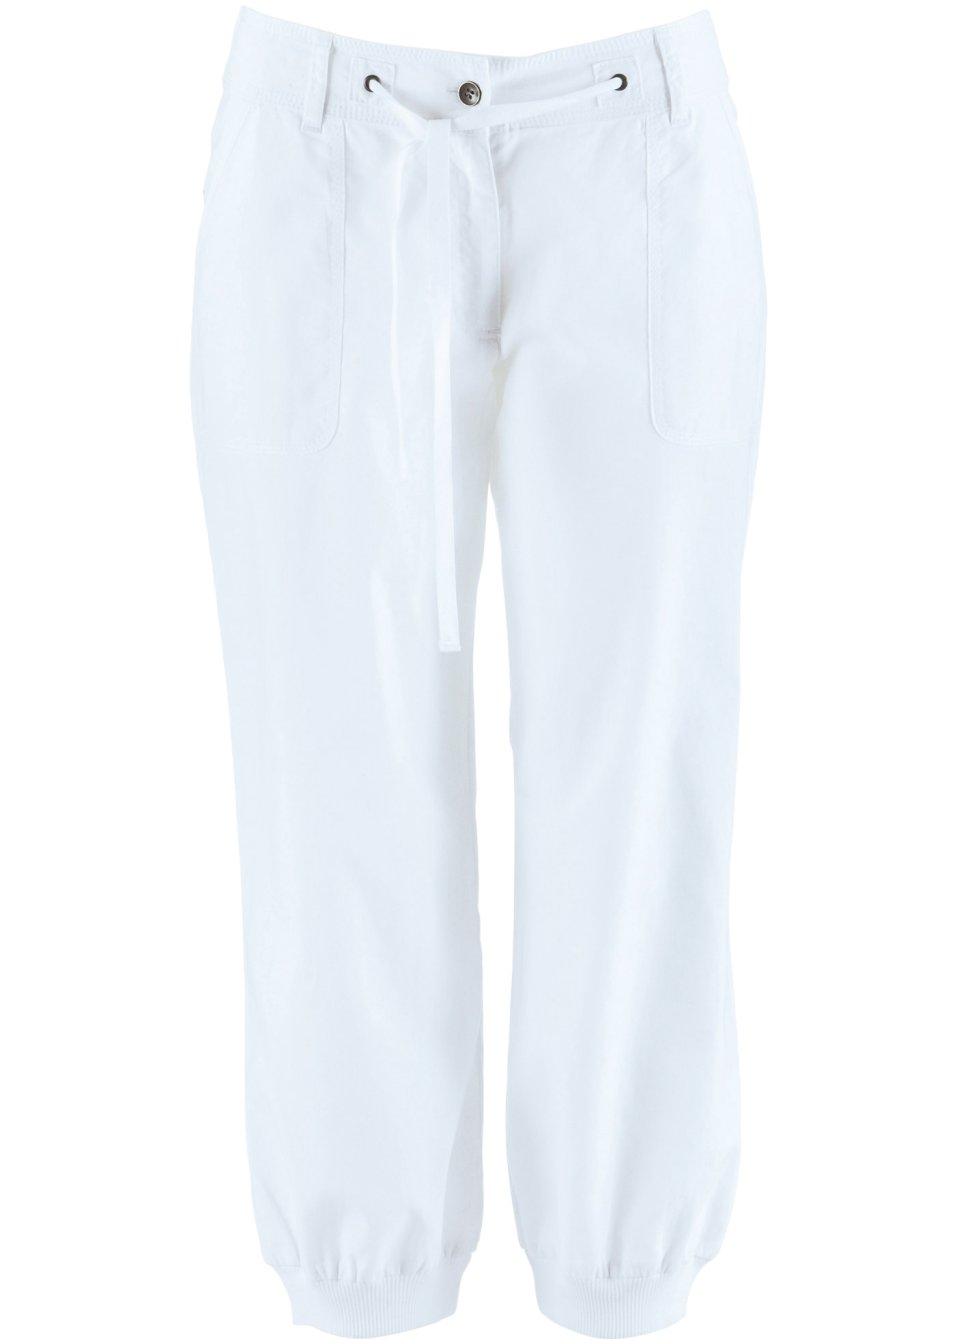 pantalon en lin 3 4 blanc bpc bonprix collection acheter online. Black Bedroom Furniture Sets. Home Design Ideas